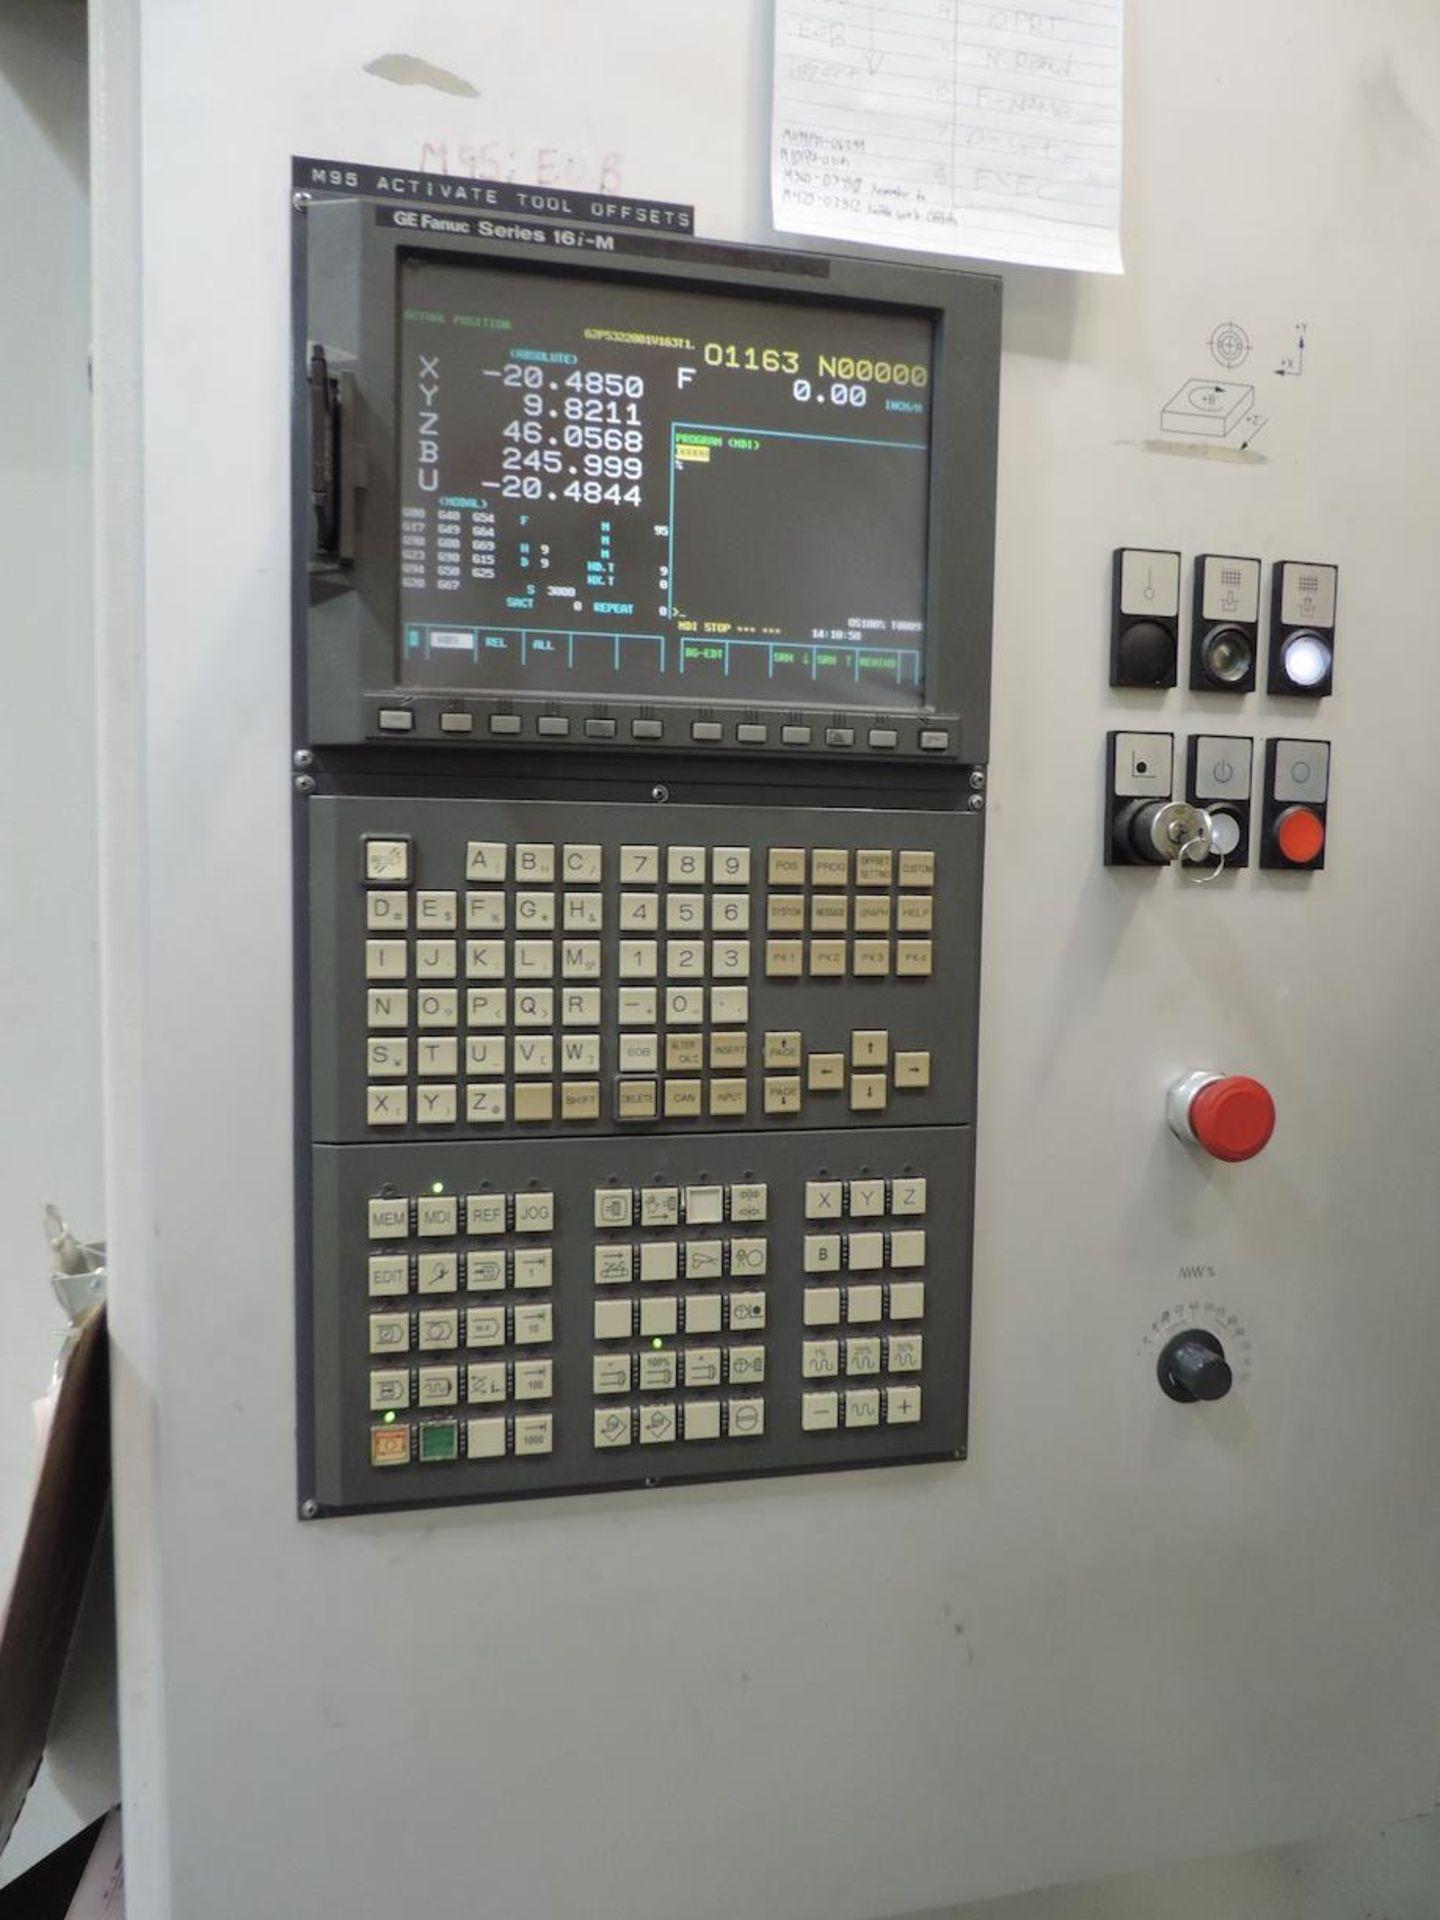 "2002 STARRAG & HECKERT CWK-630D HMC, GE FANUC 16i-M CONTROL, XYZ TRAVELS: 41"" X 39"" X 45"", 24.8"" X - Image 9 of 20"